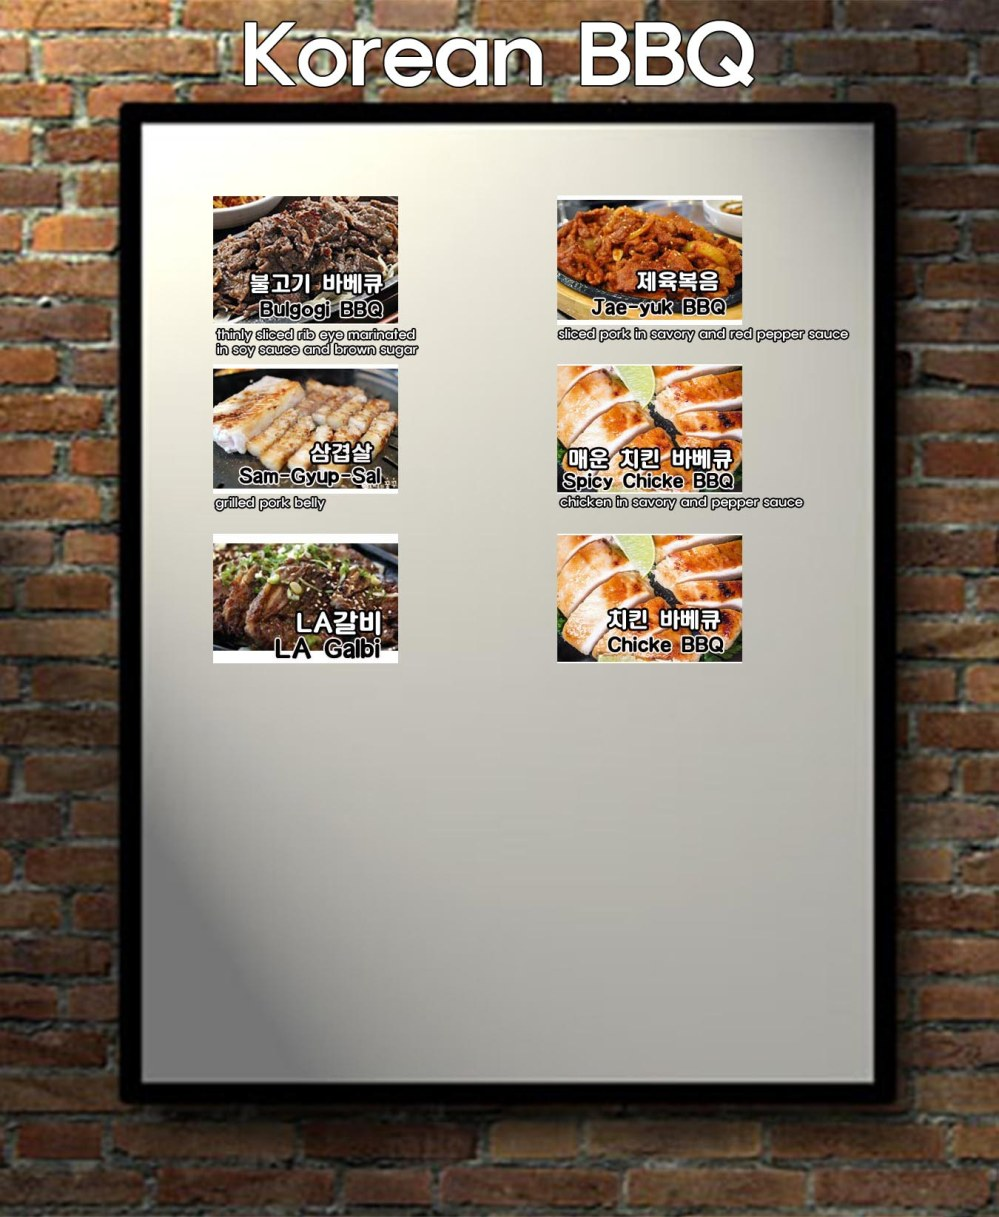 korean bbq website image